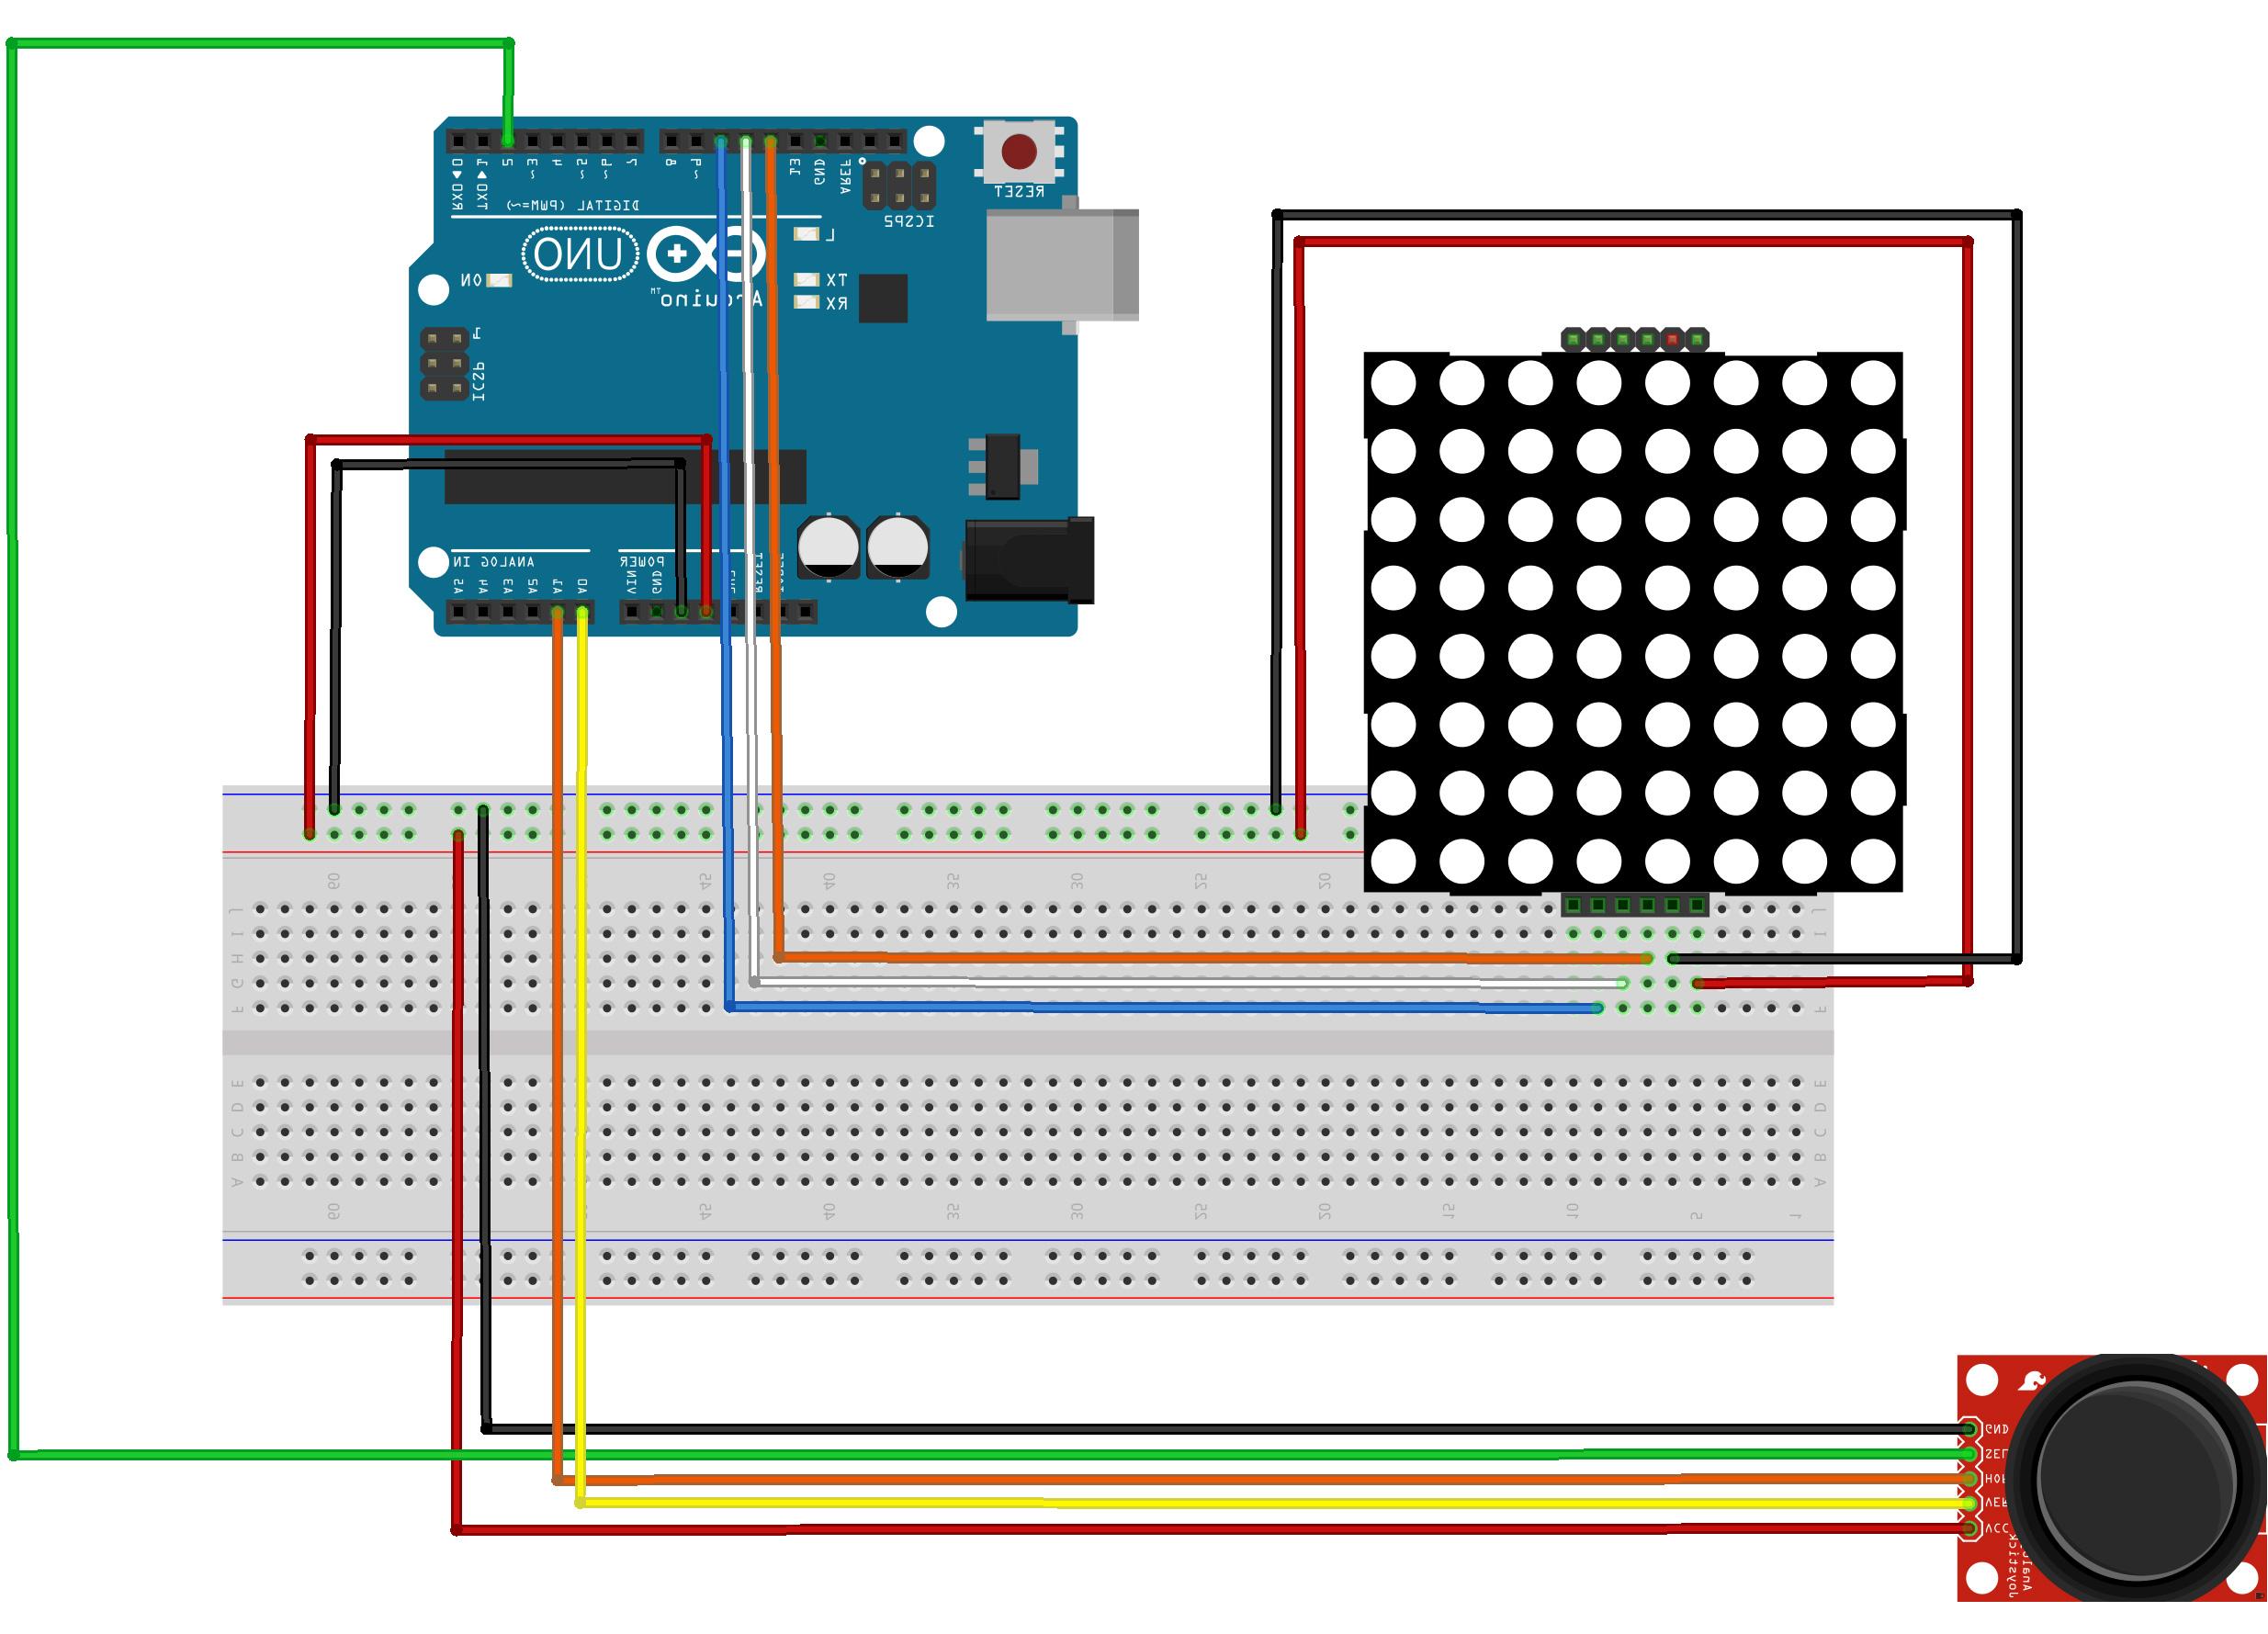 8x8 Led Matrix Şekil Çizdirme